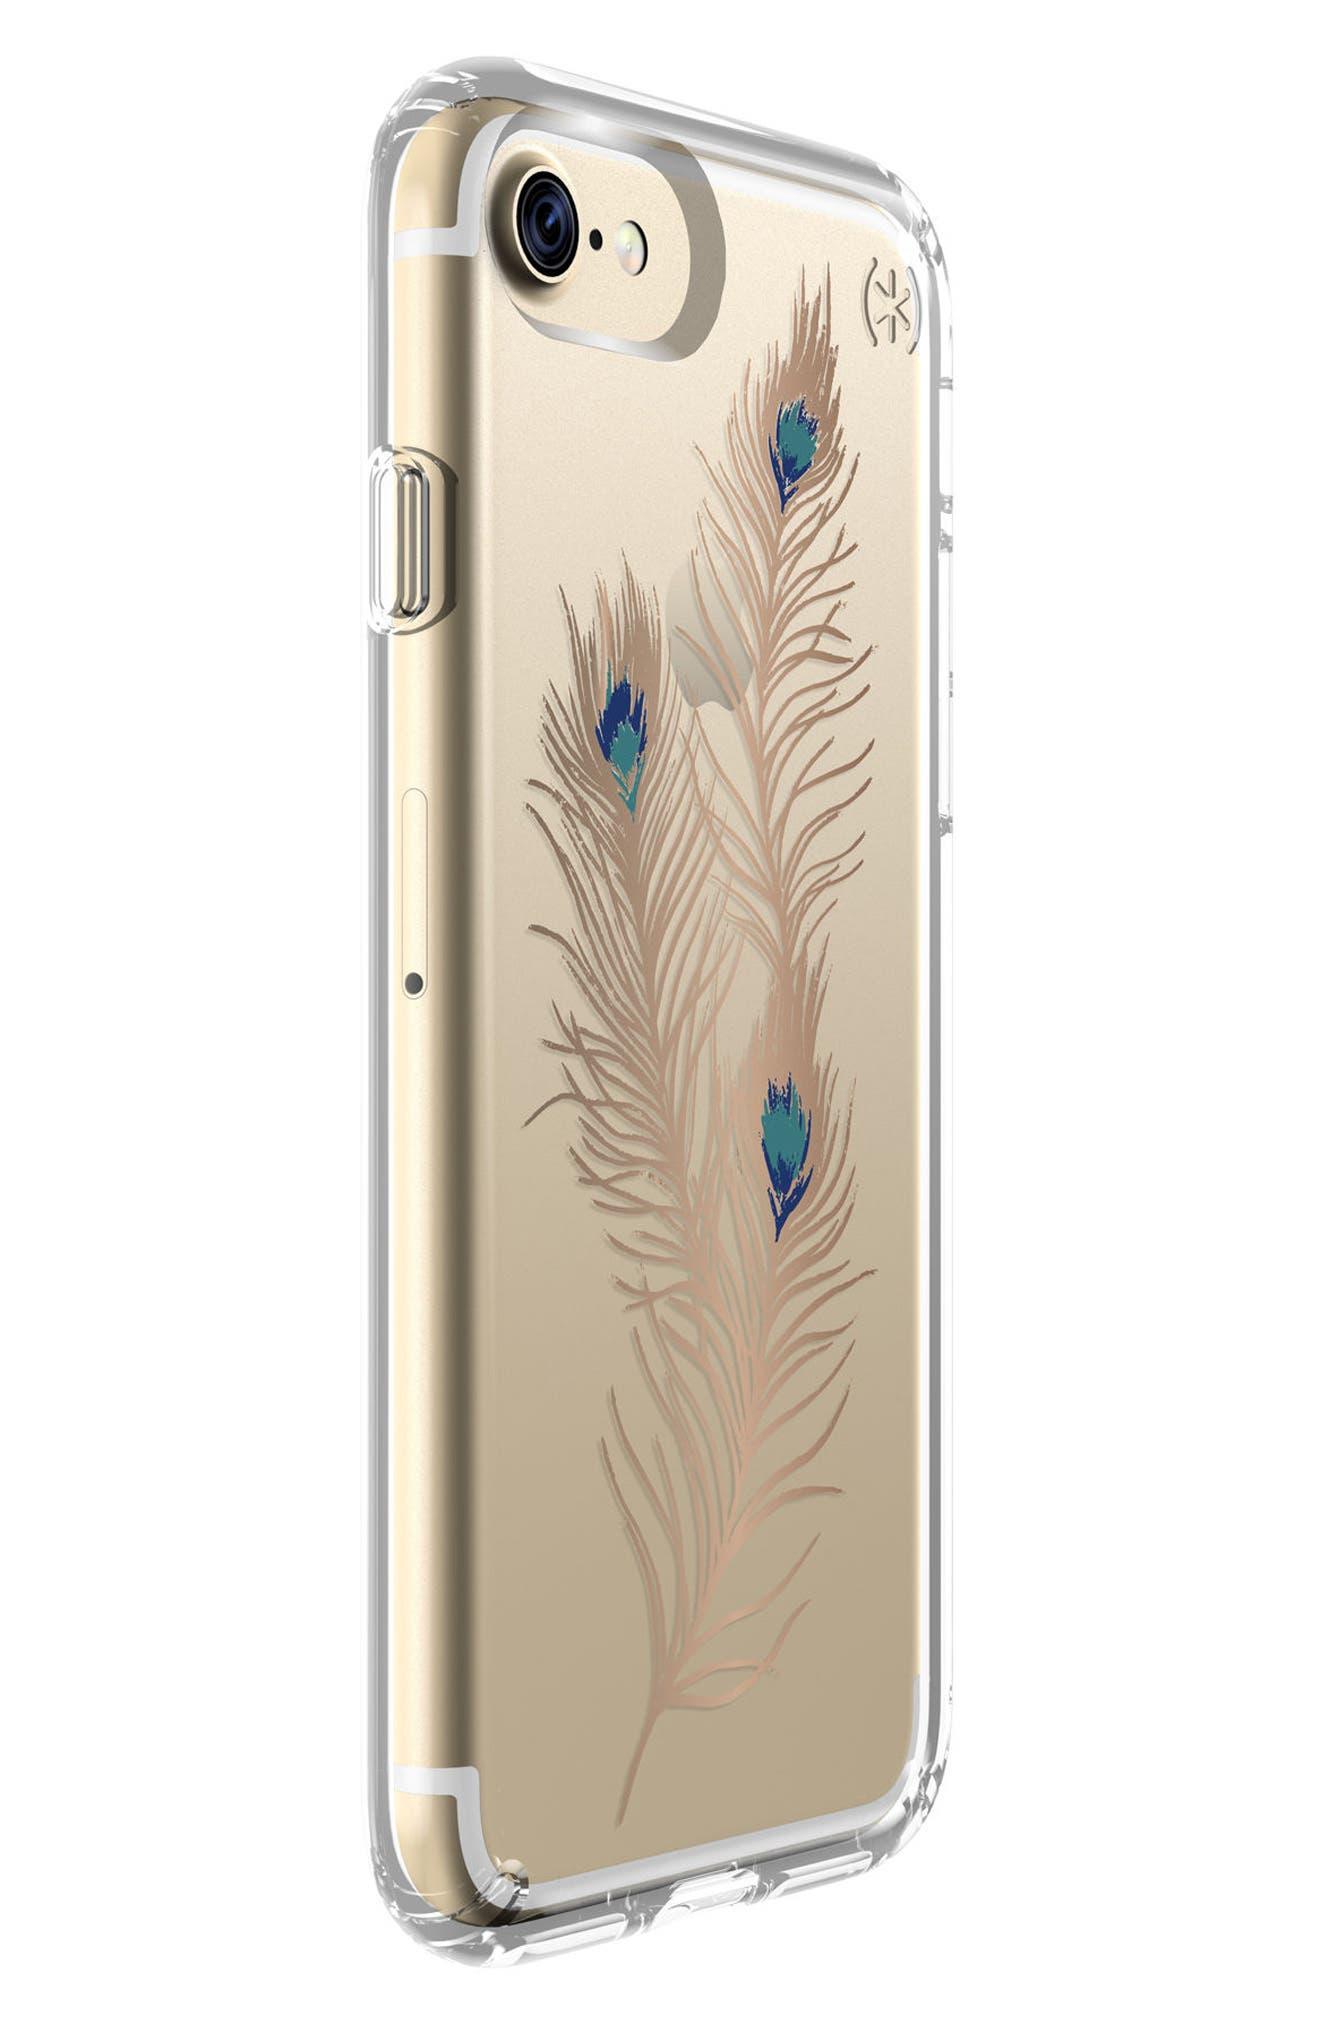 Speck Presidio Clear iPhone 6/6s/7 Case